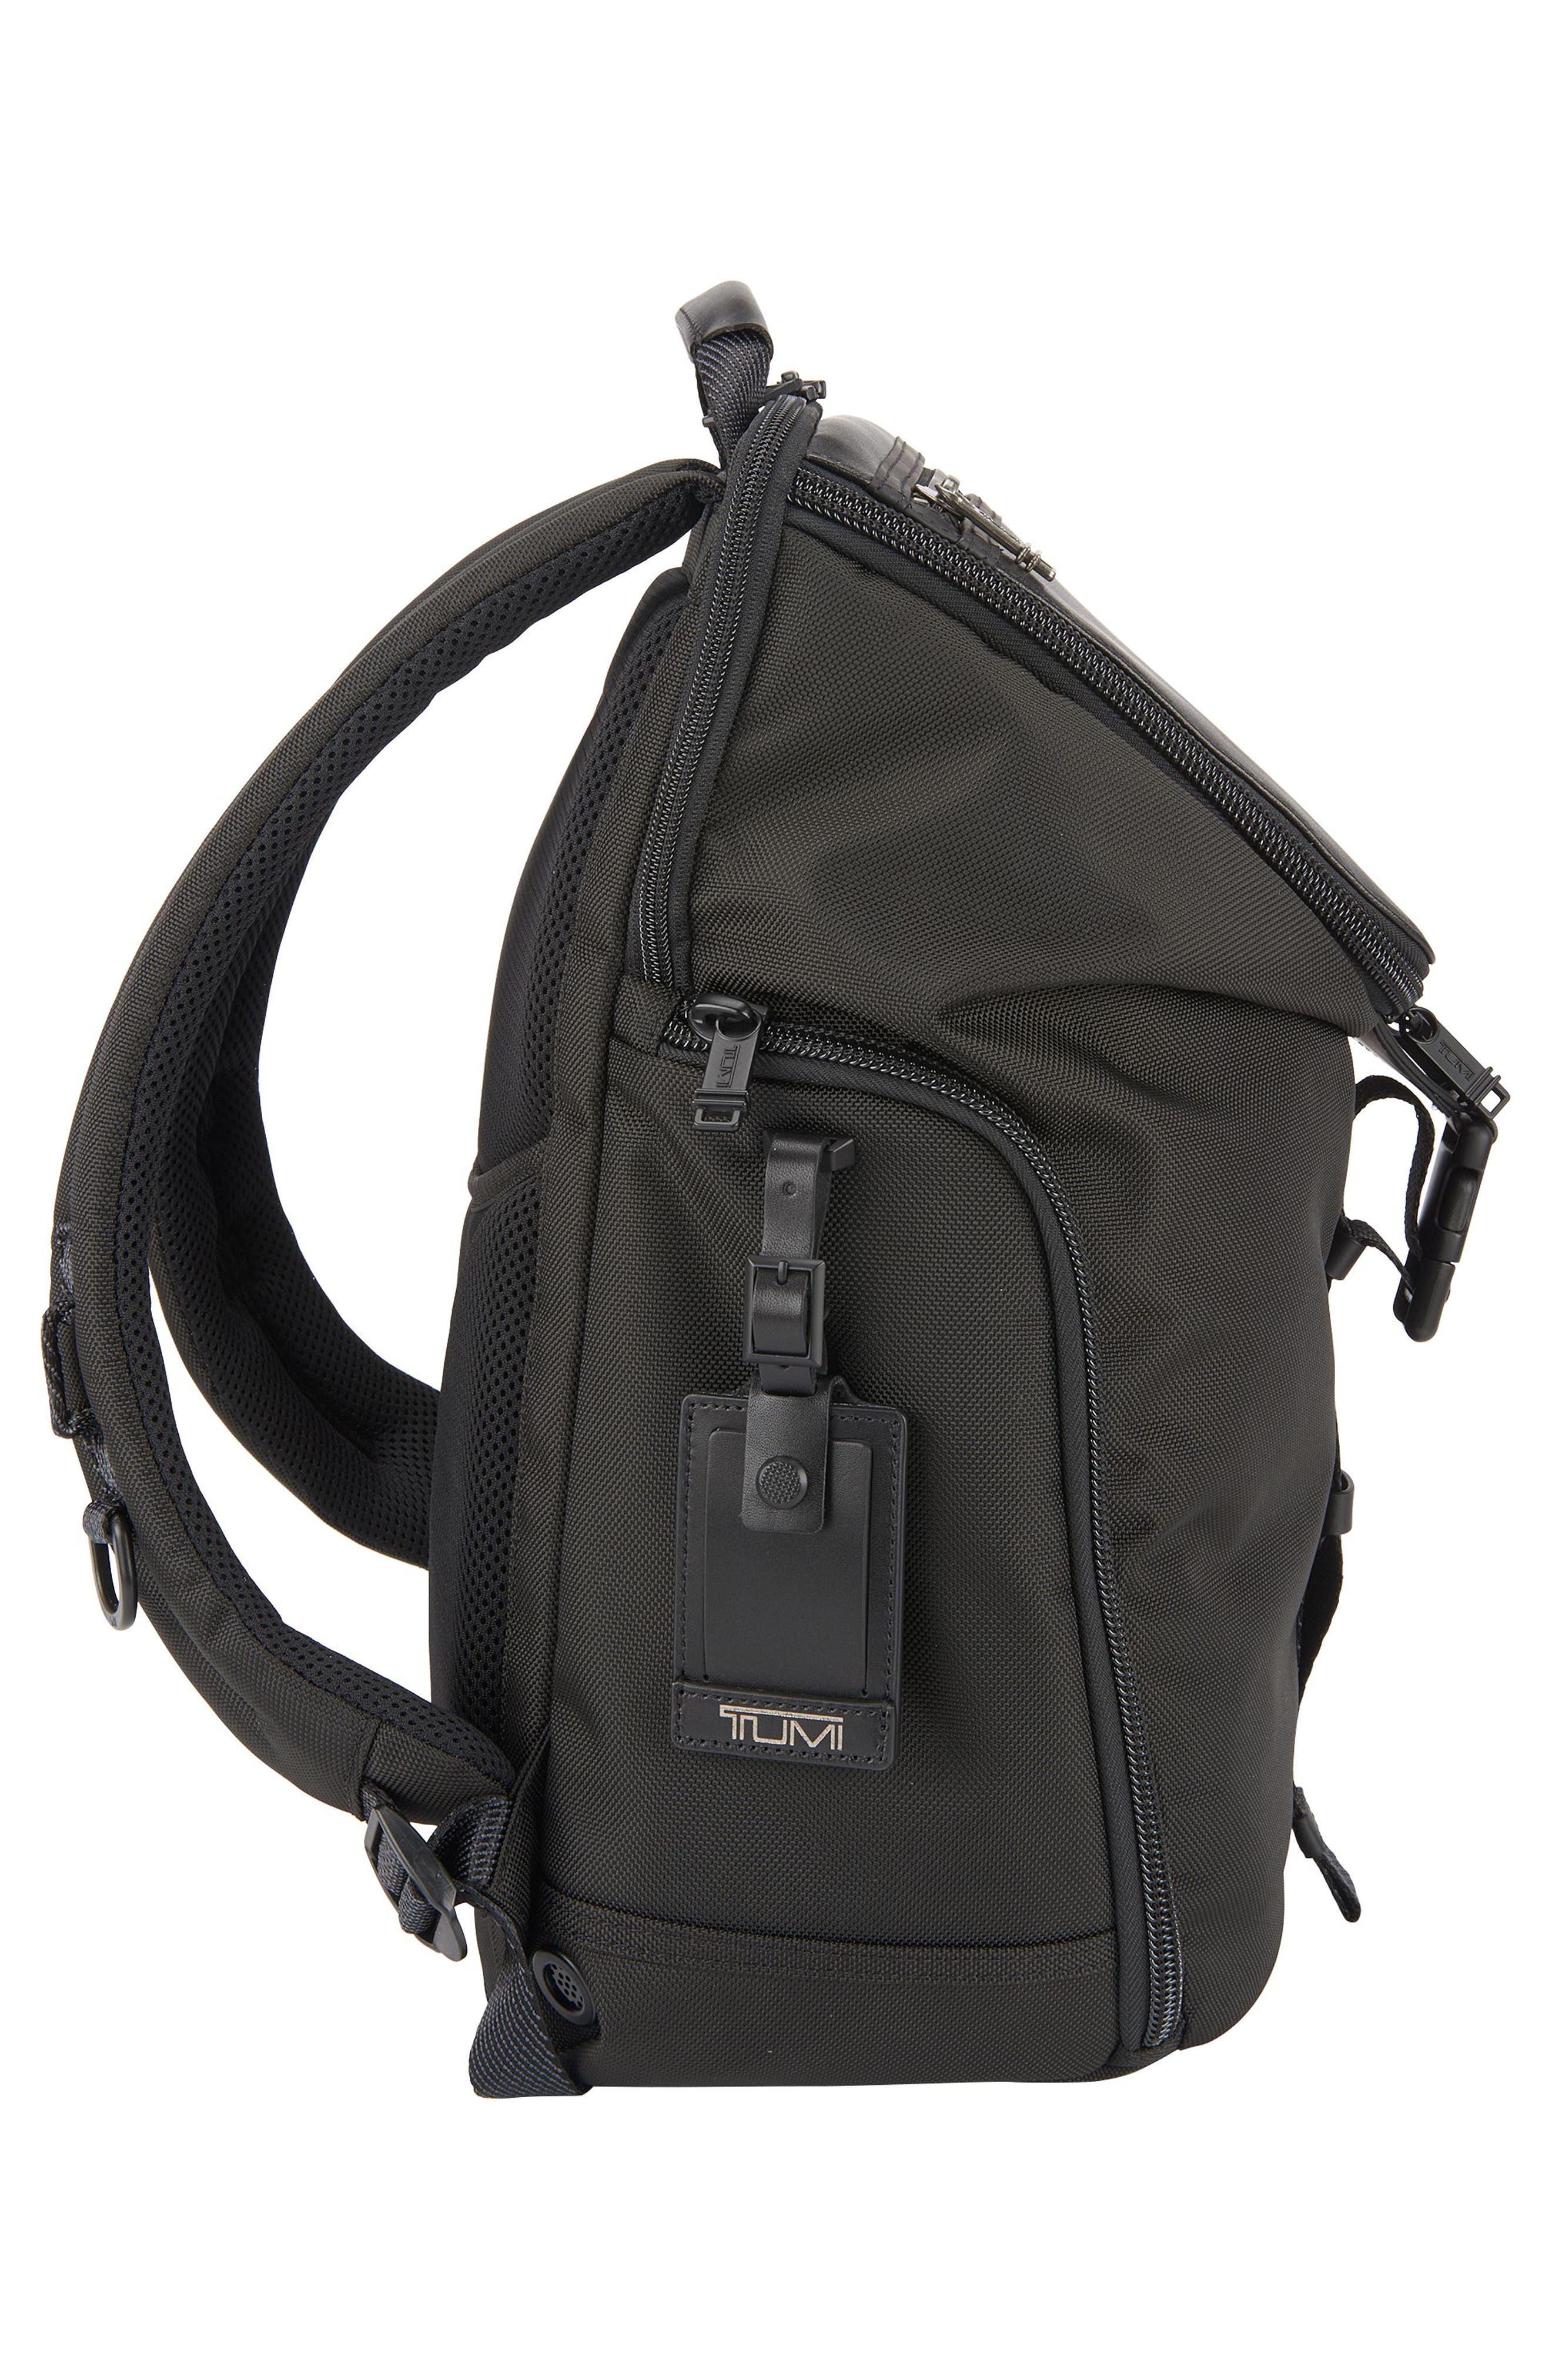 TUMI,                             Alpha Bravo - Willow Backpack,                             Alternate thumbnail 4, color,                             001